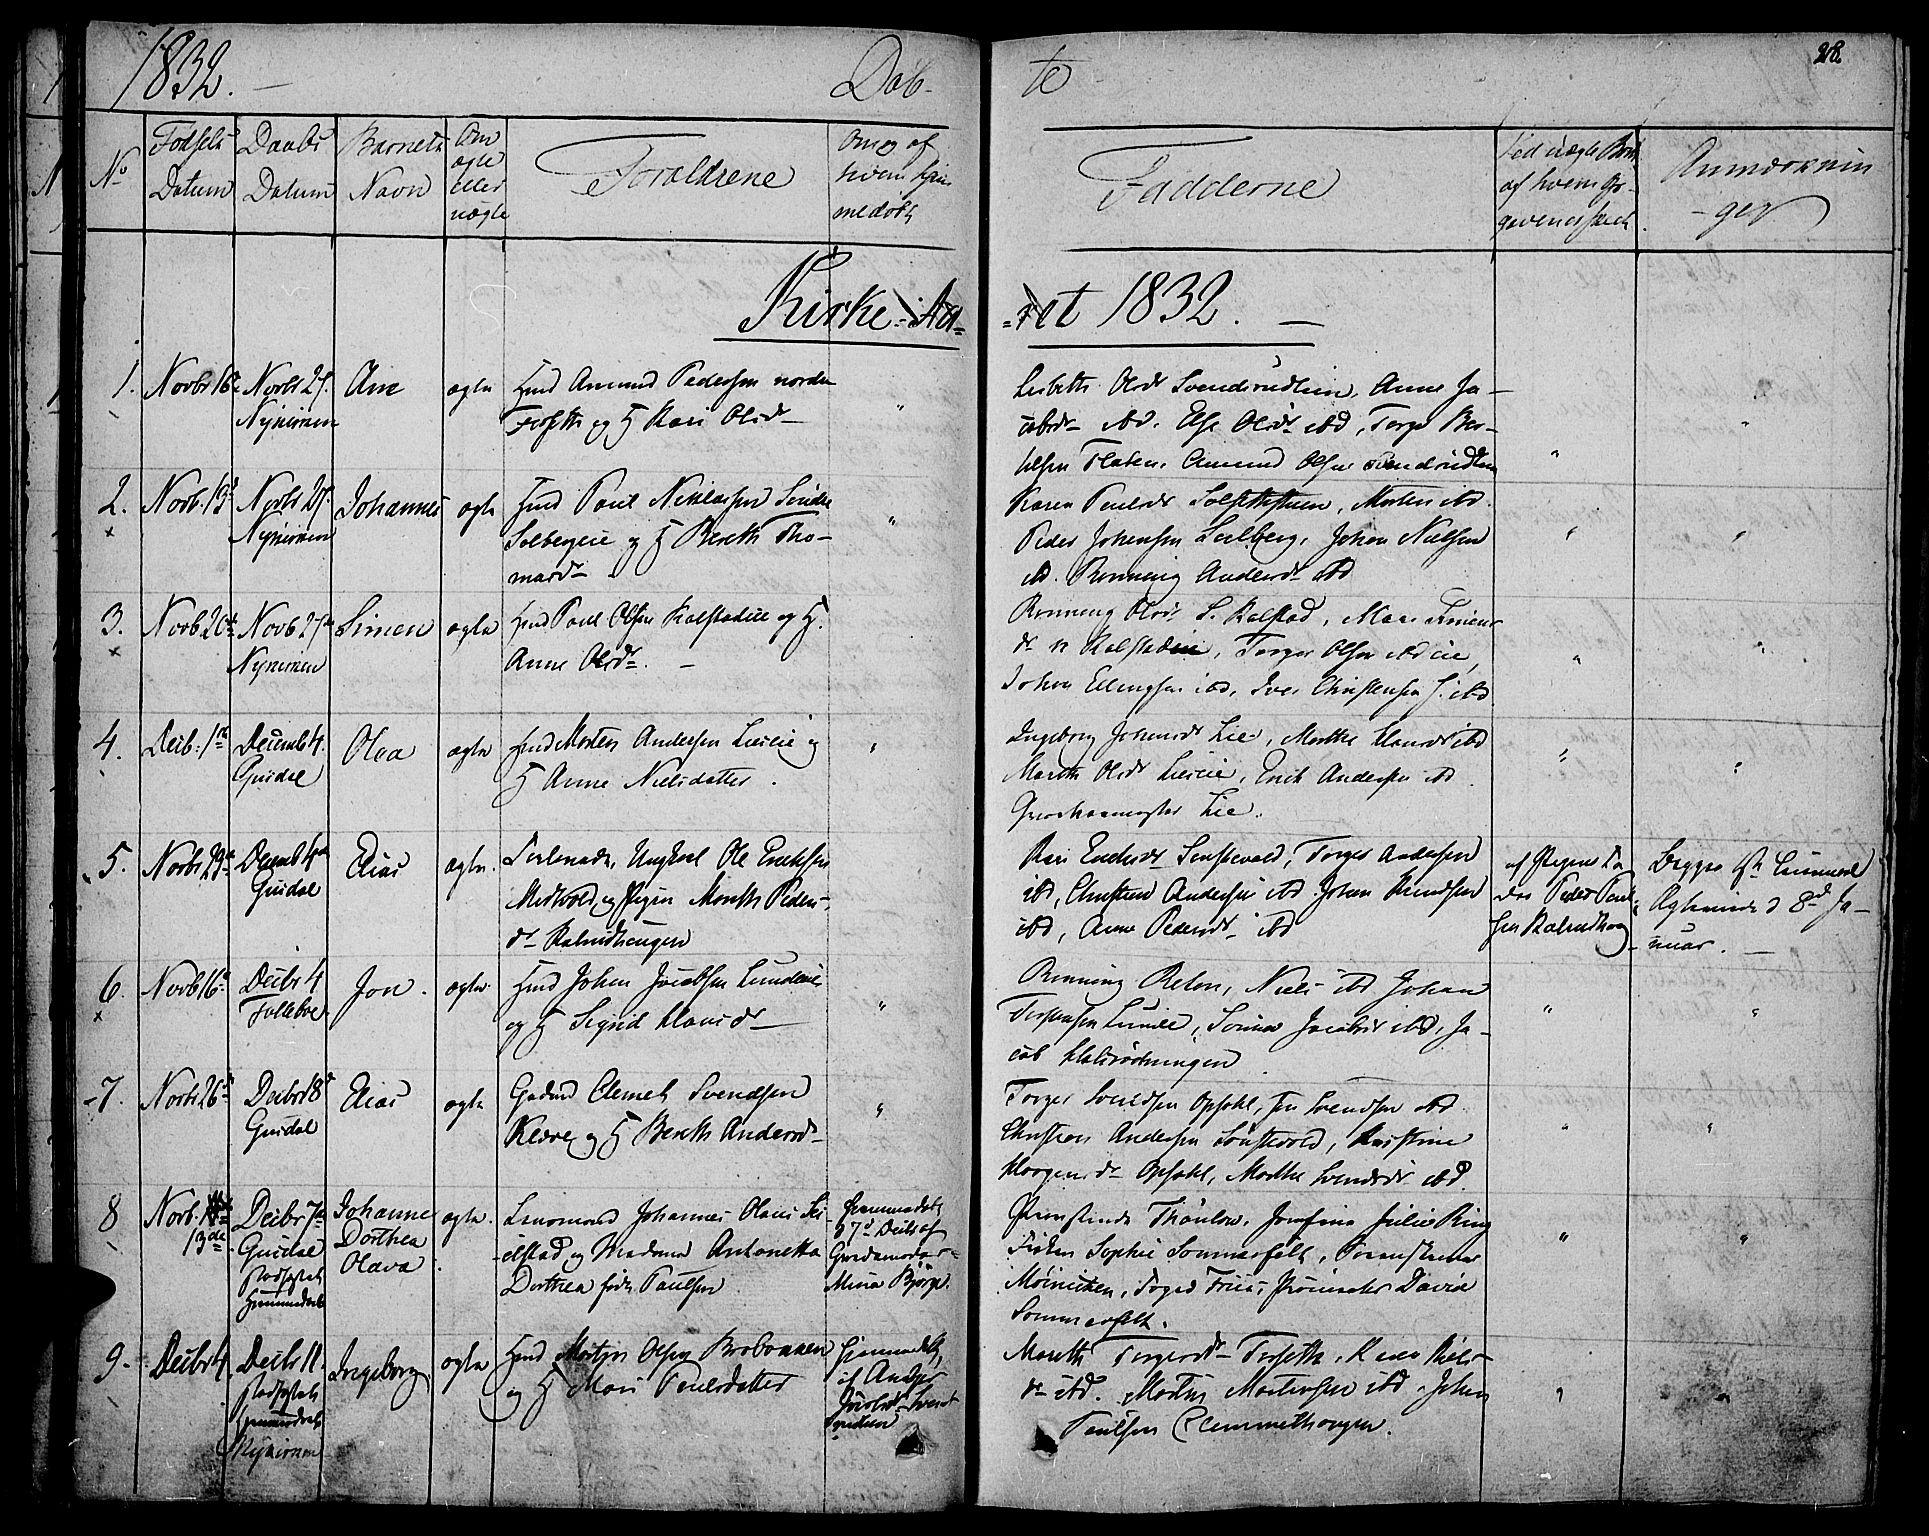 SAH, Gausdal prestekontor, Ministerialbok nr. 6, 1830-1839, s. 28